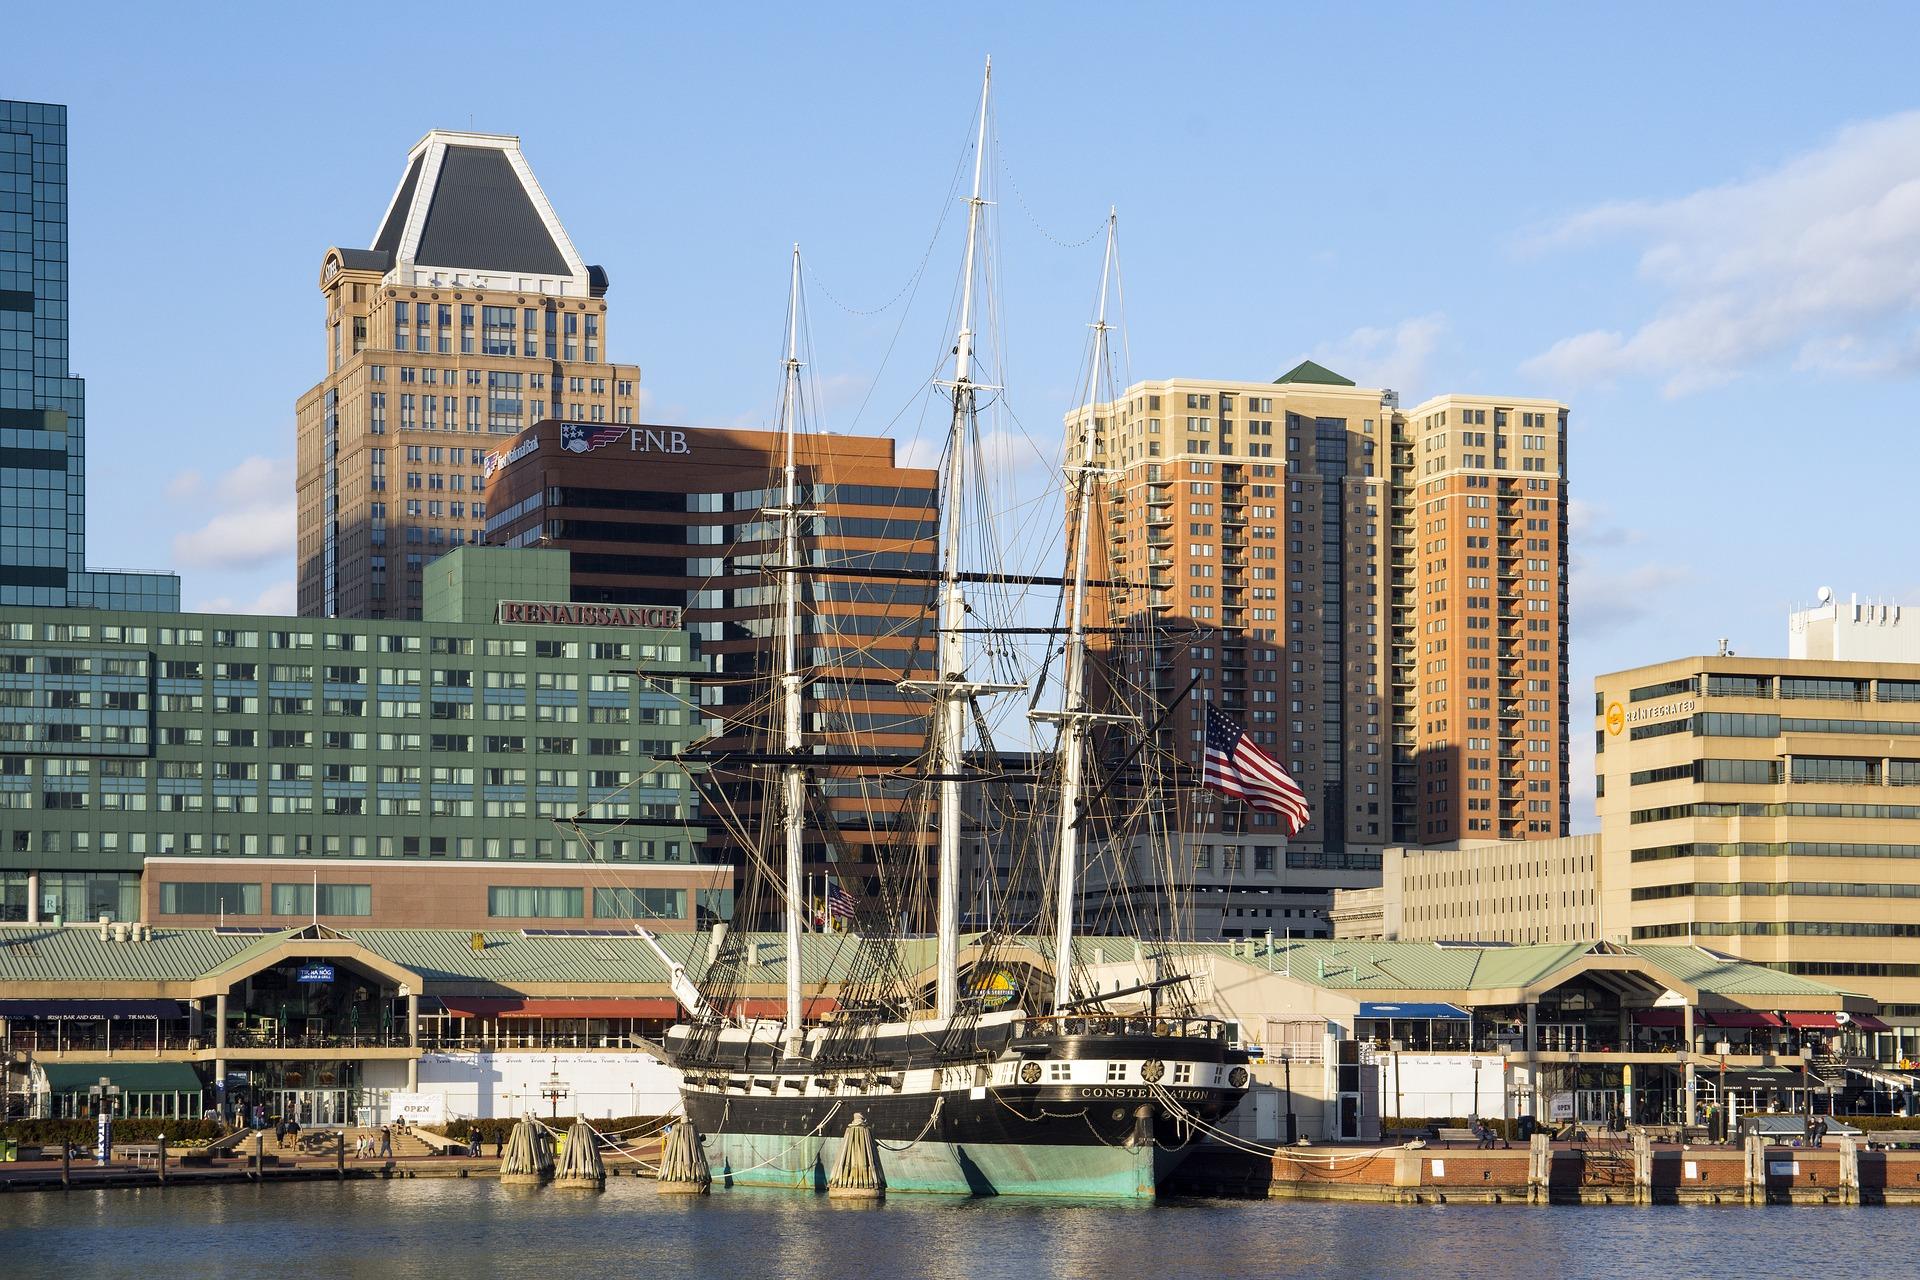 Baltimore Development Corporation Introduces Inclusive Plan for Startups